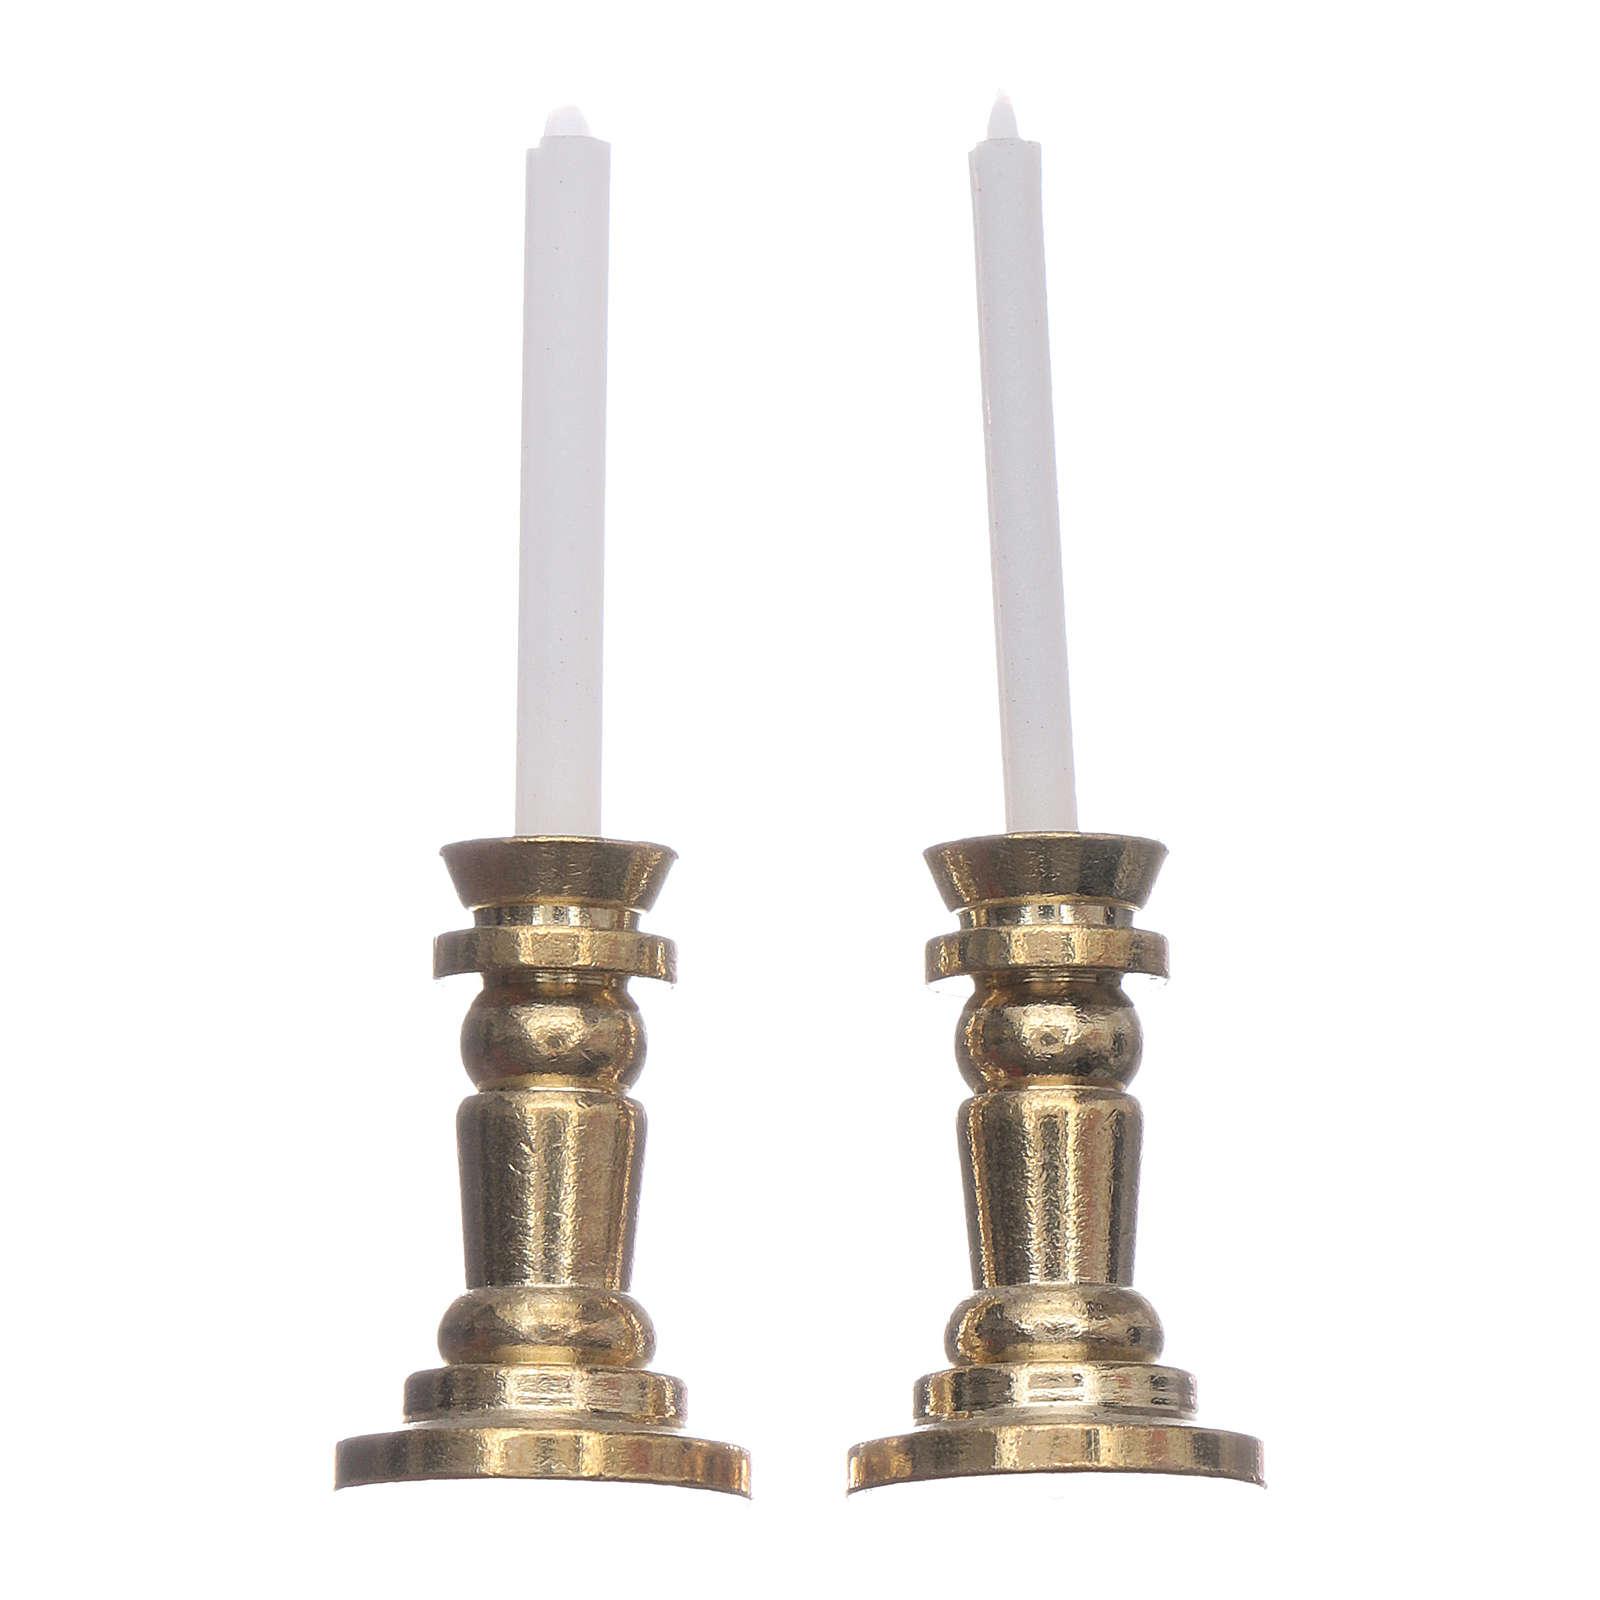 Coppia candelieri presepe h reale 3,5 cm 4